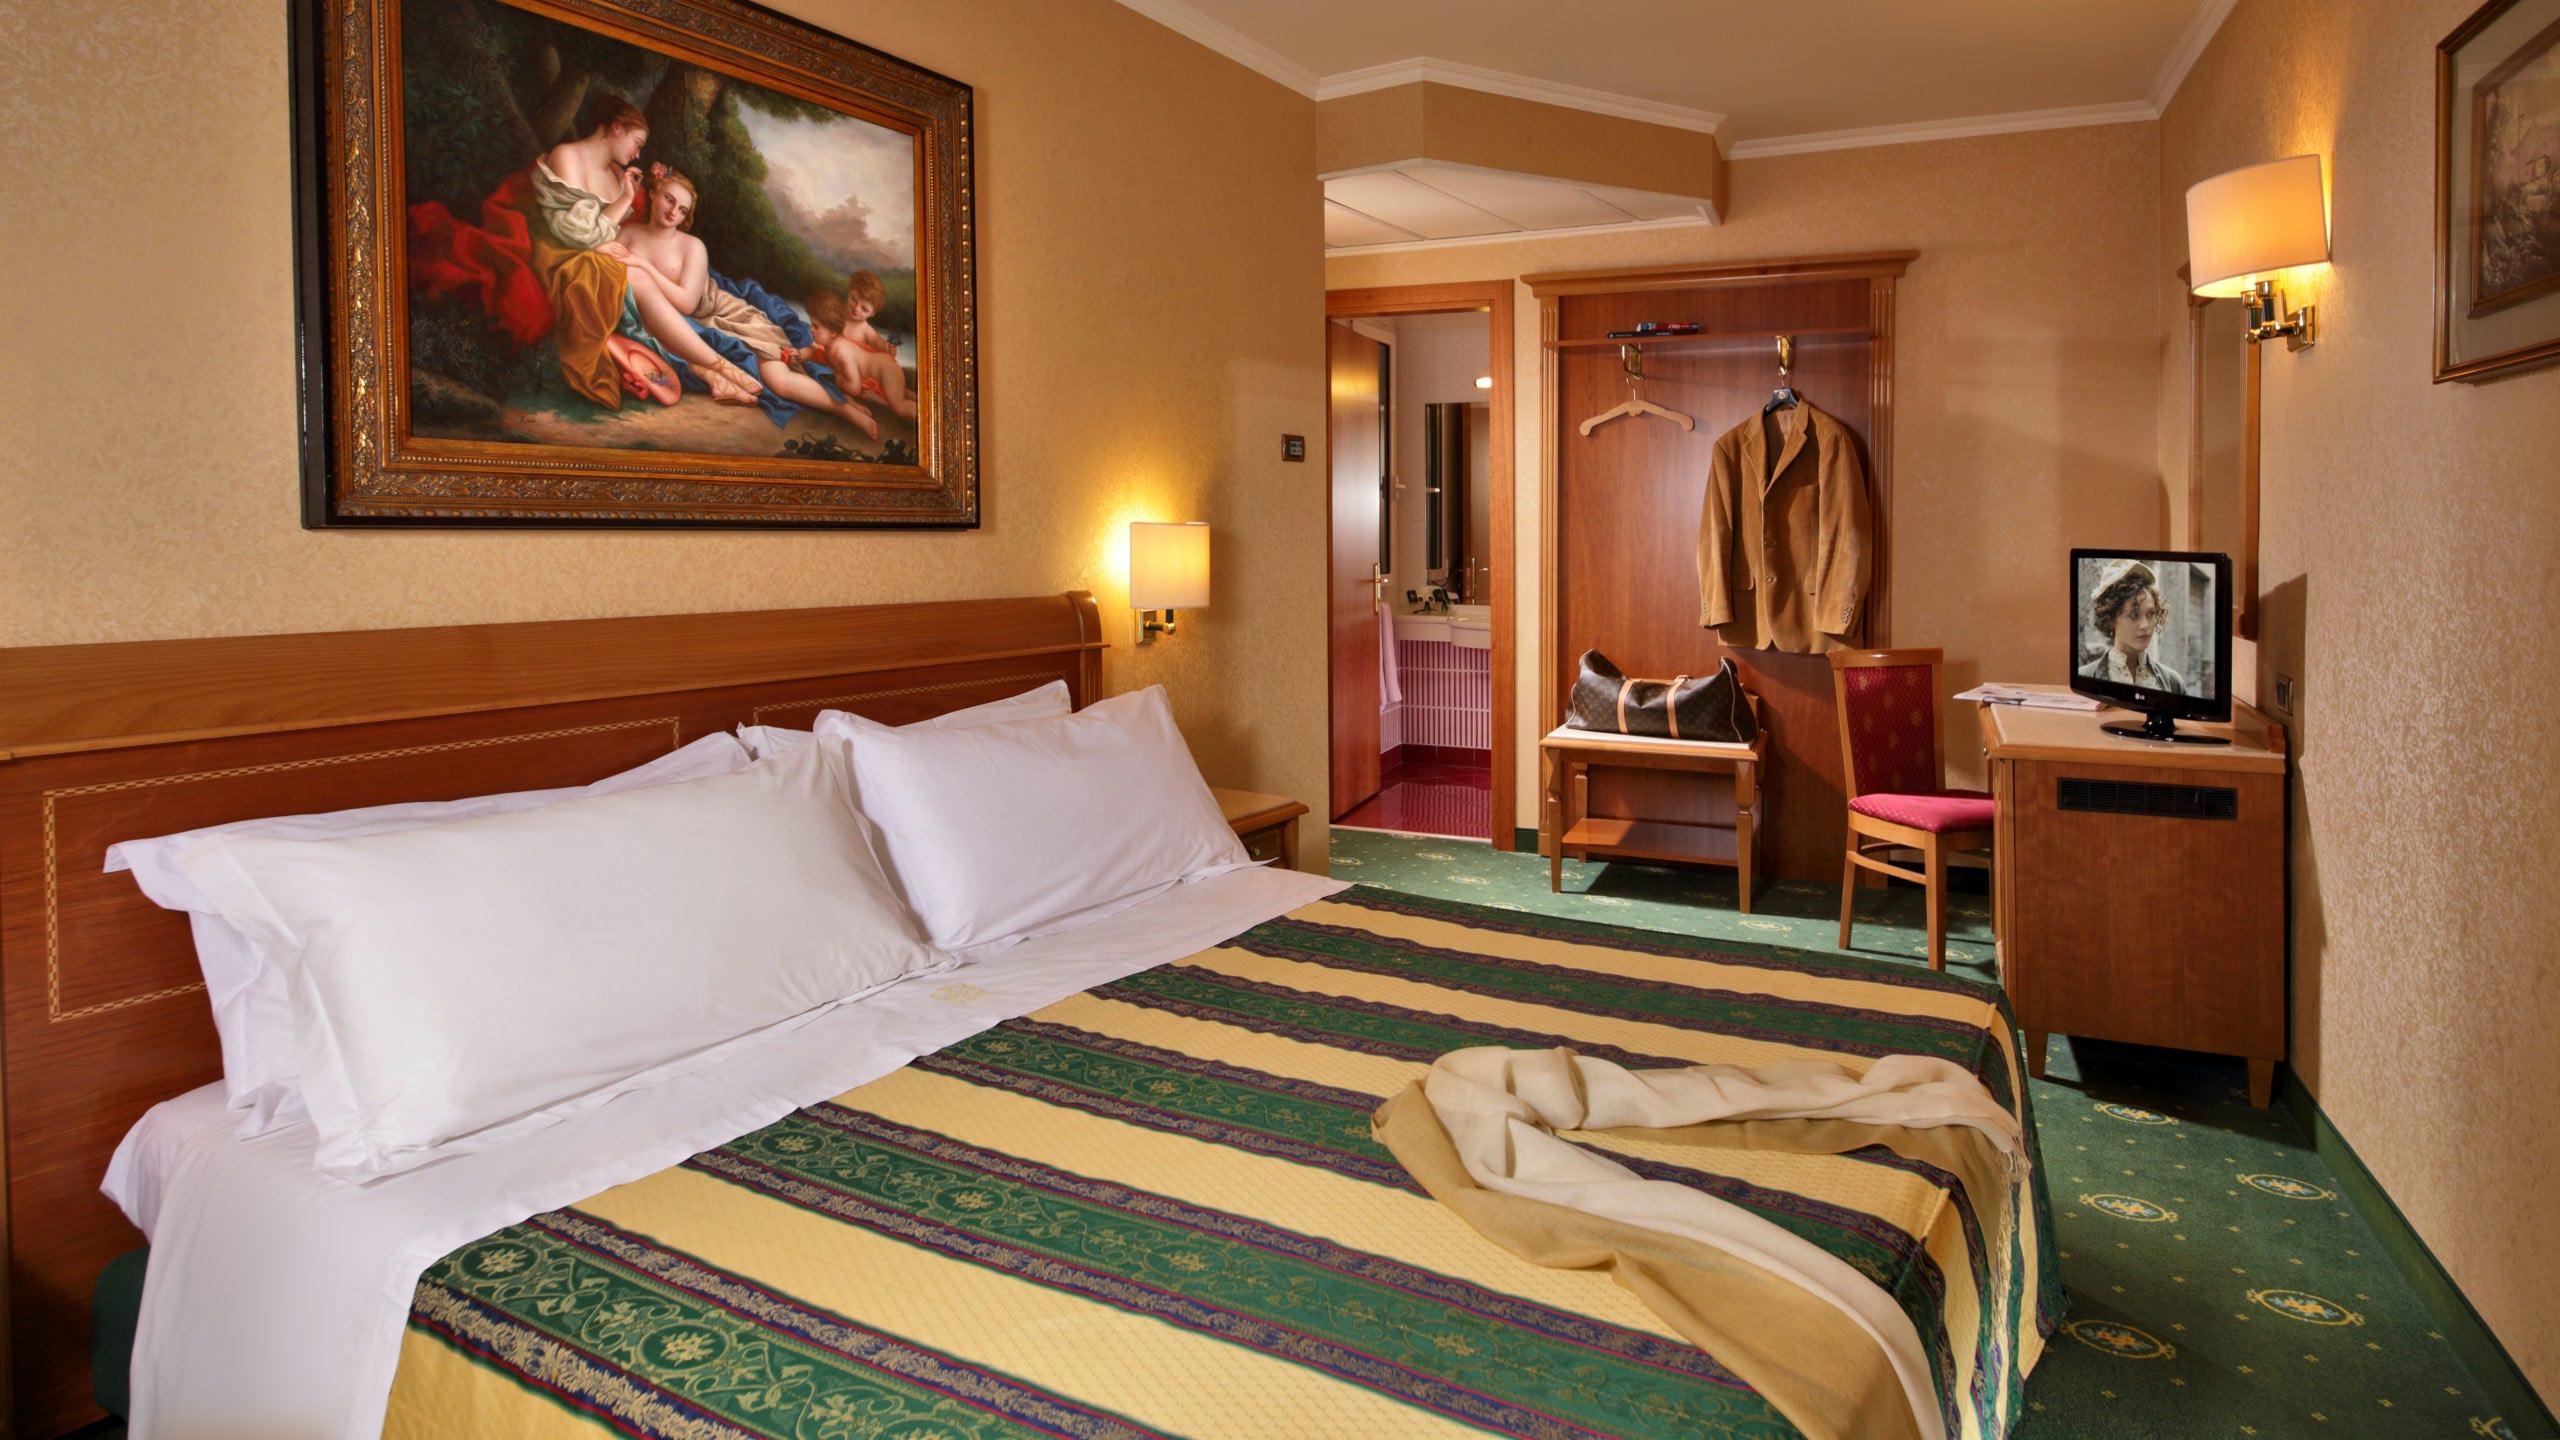 Hotel-Colonna-Frascati-camera-11